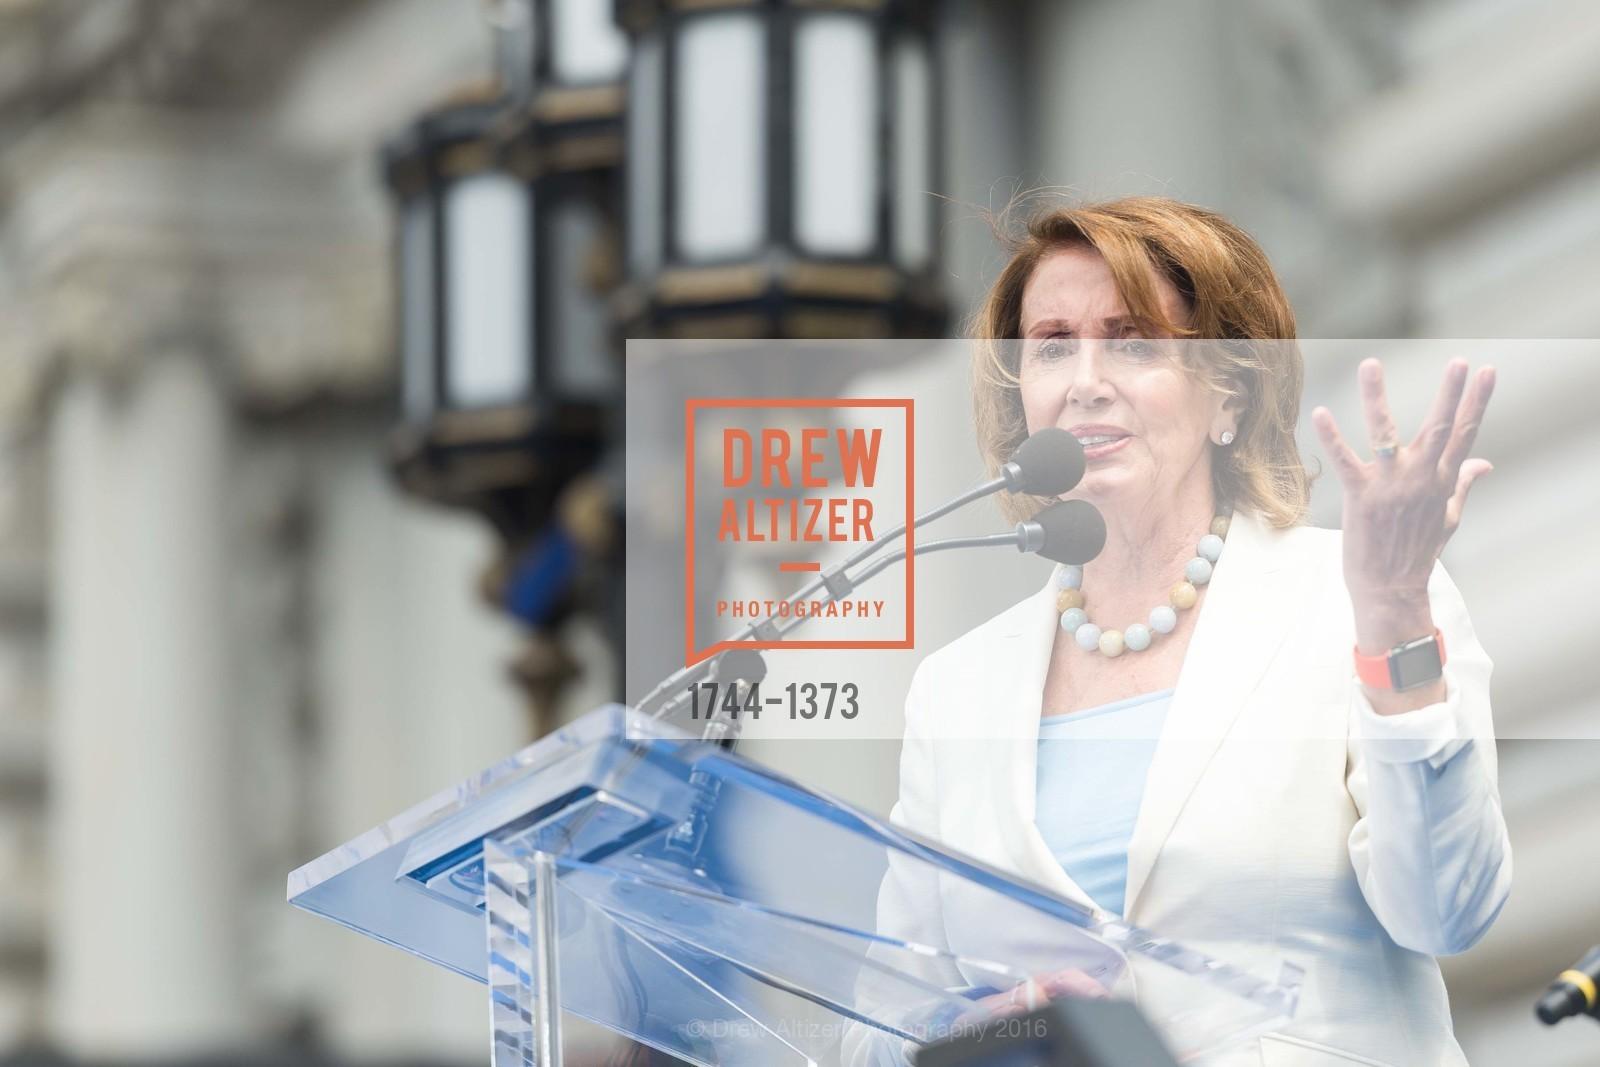 Nancy Pelosi, Photo #1744-1373